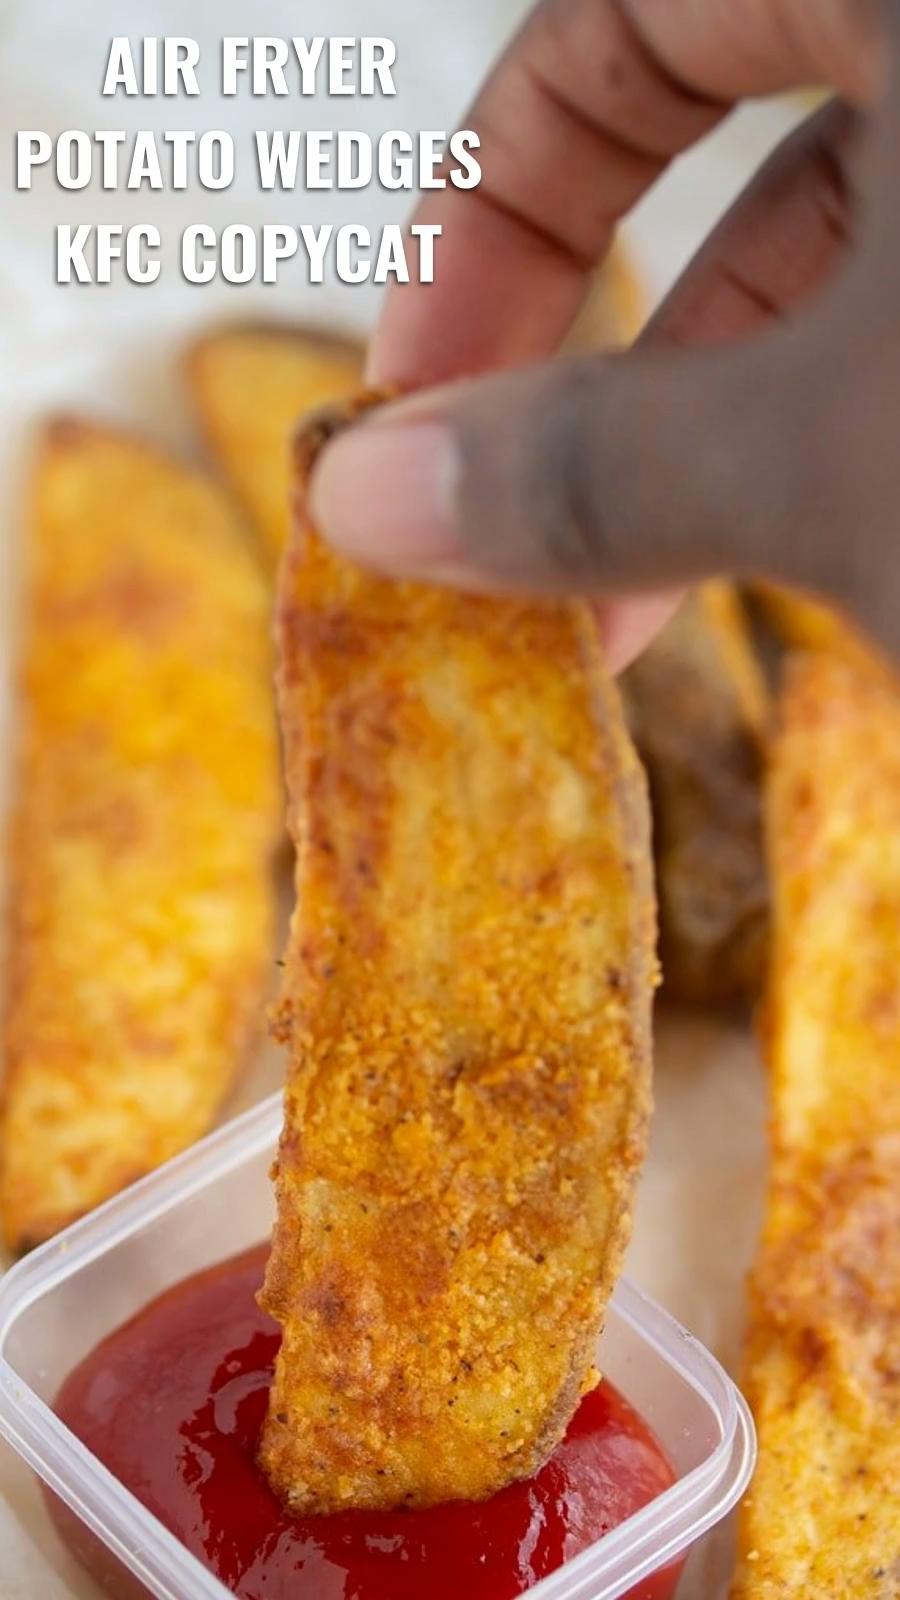 Air Fryer Potato Wedges (KFC Copycat) Recipe My